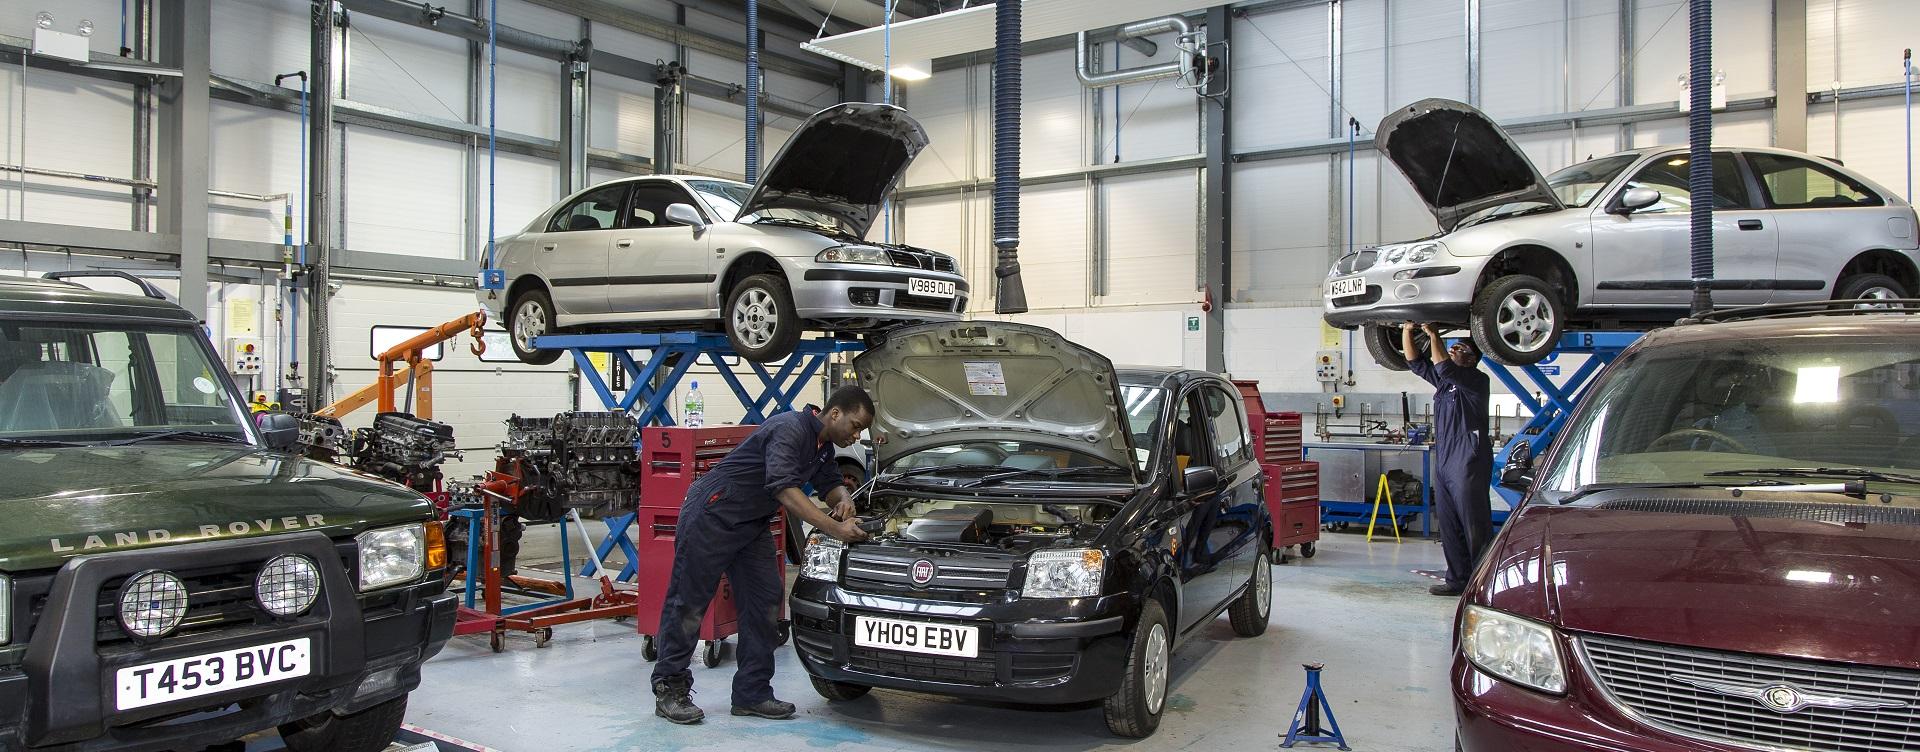 New BMW Car Parts London Online